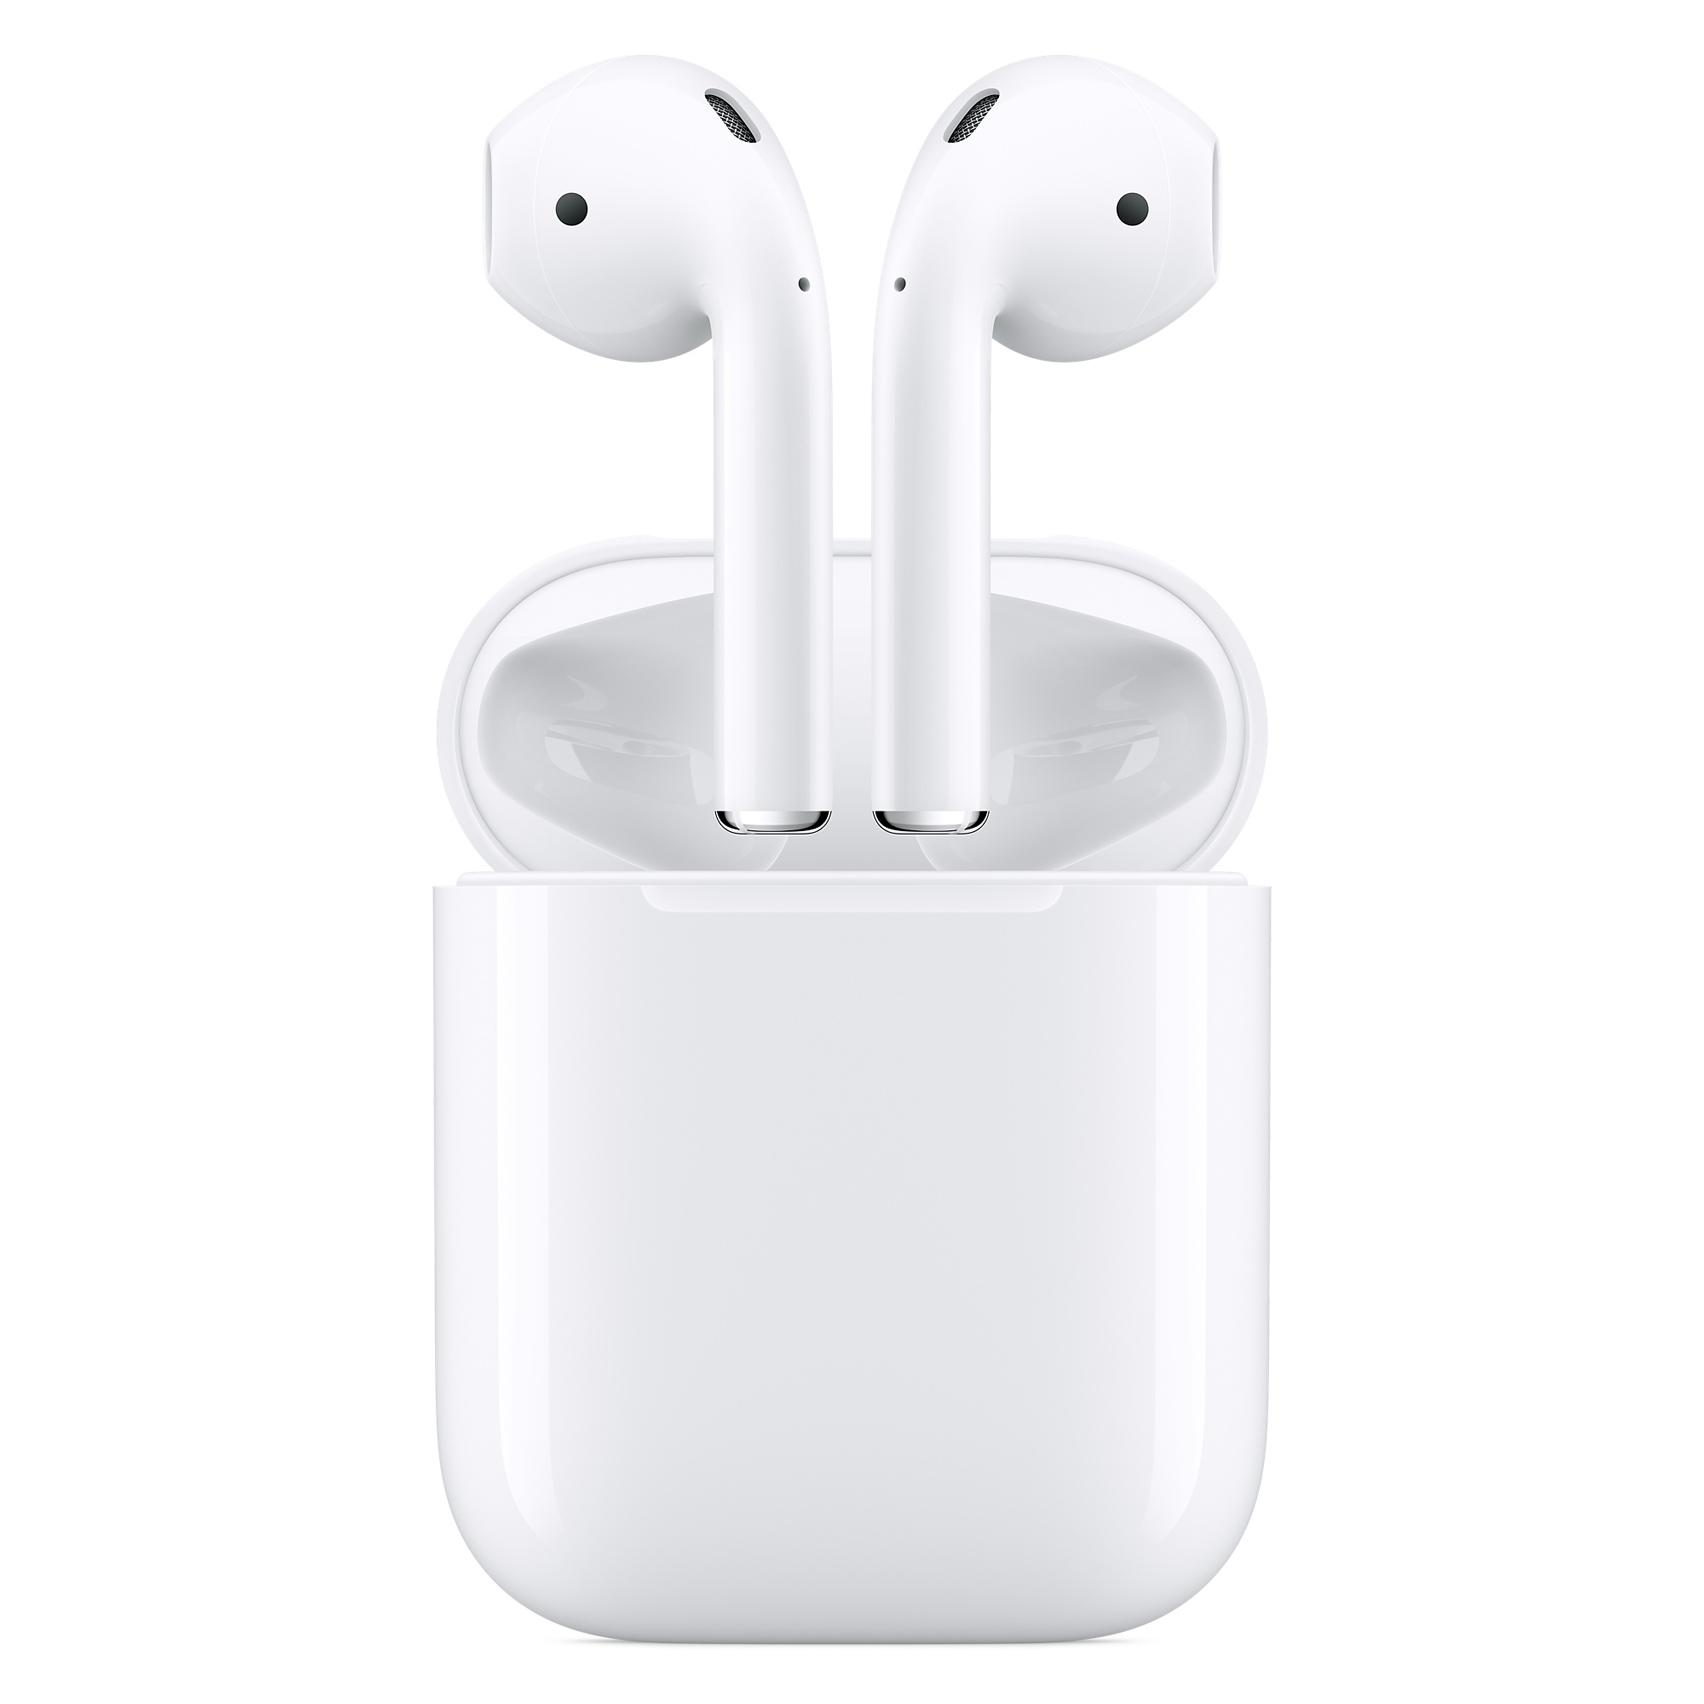 Apple AirPod wireless headphones